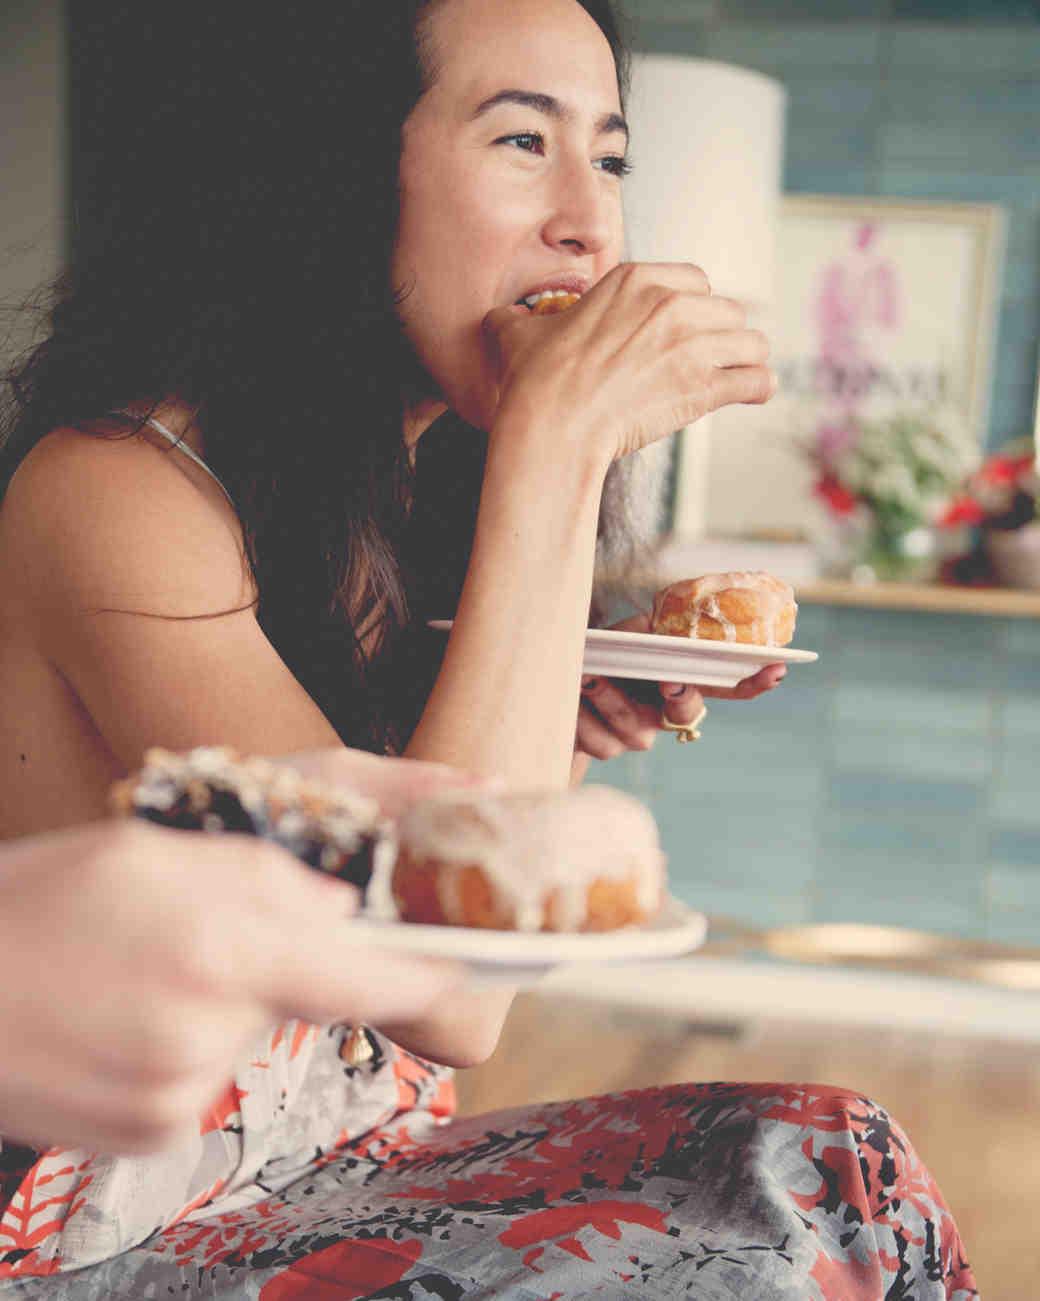 claire-thomas-bridal-shower-tea-eating-donuts-0814.jpg